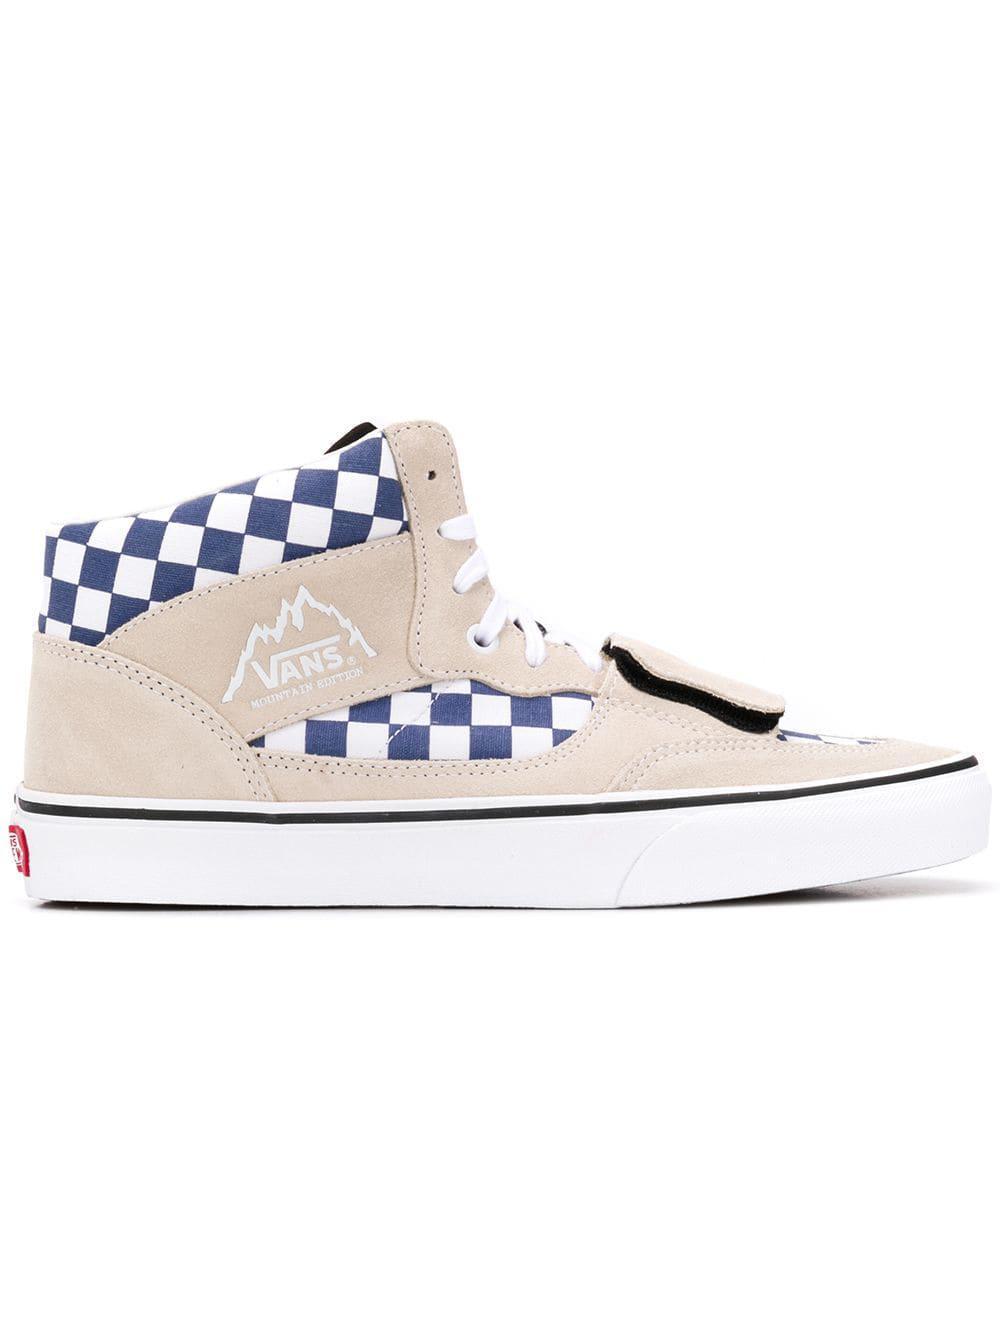 14c55556d6 Vans Mountain Edition Hi-top Sneakers in Blue for Men - Lyst